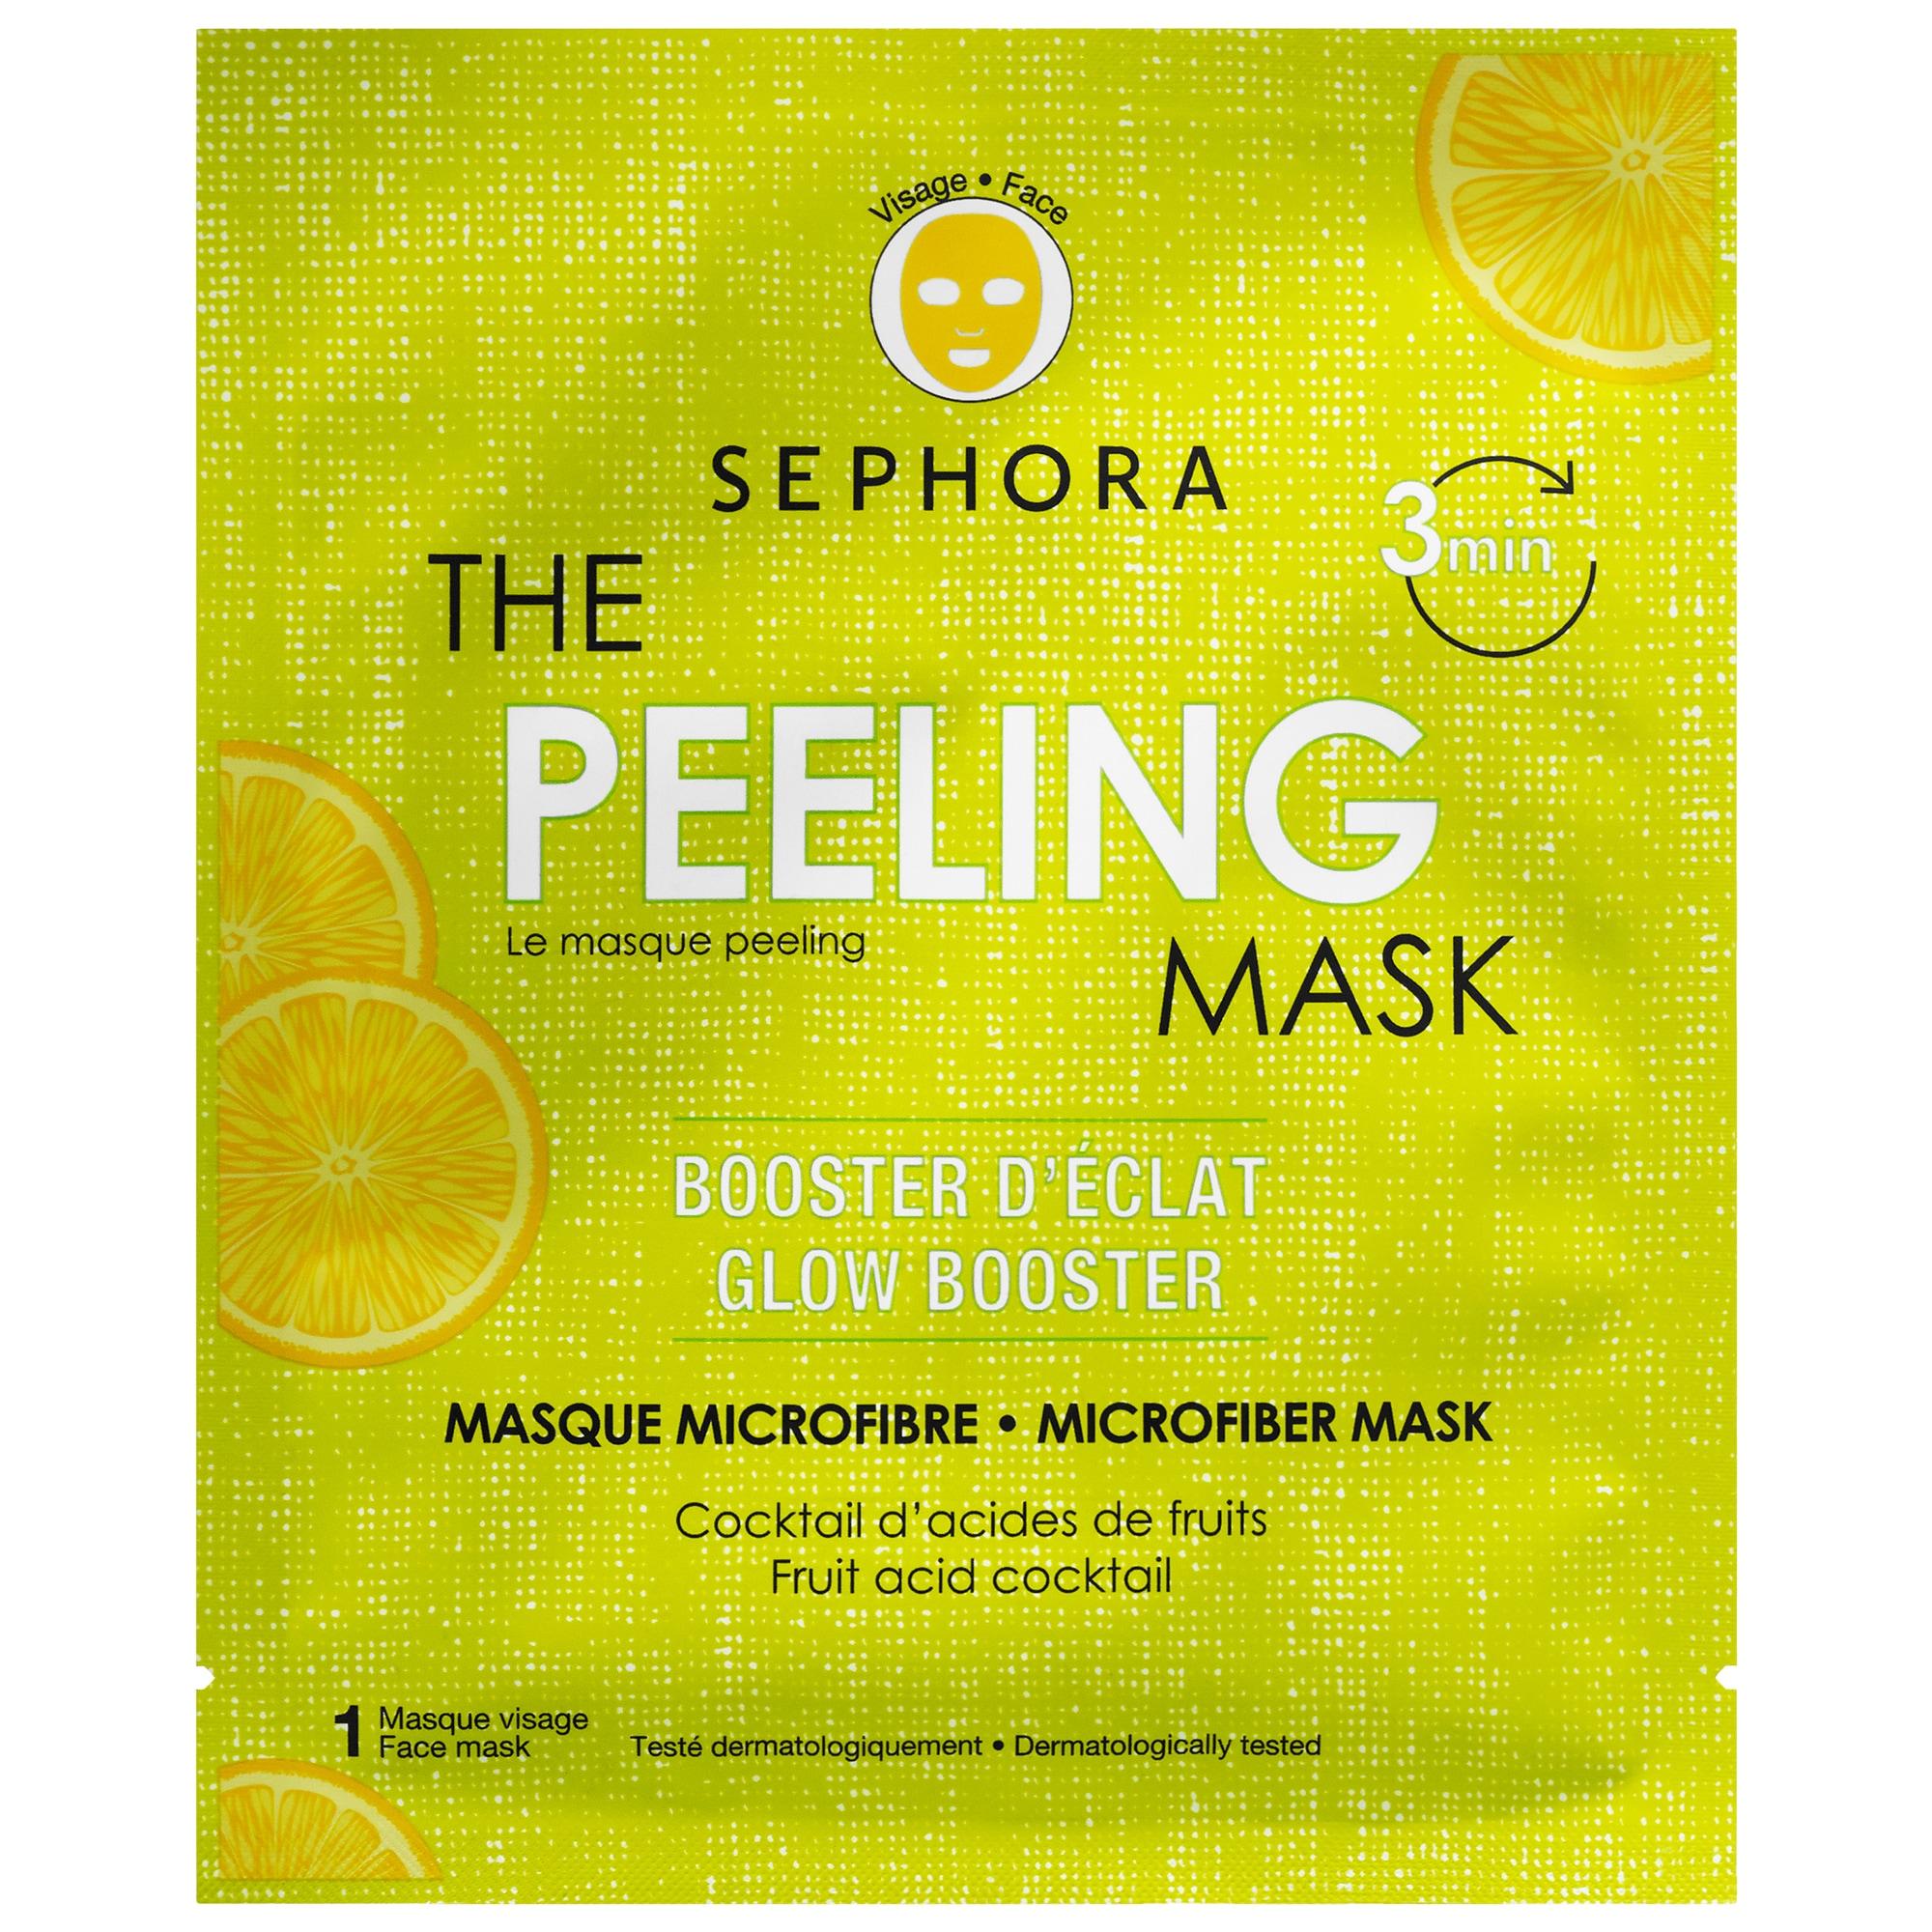 Sephora - SUPERMASK - The Peeling Mask